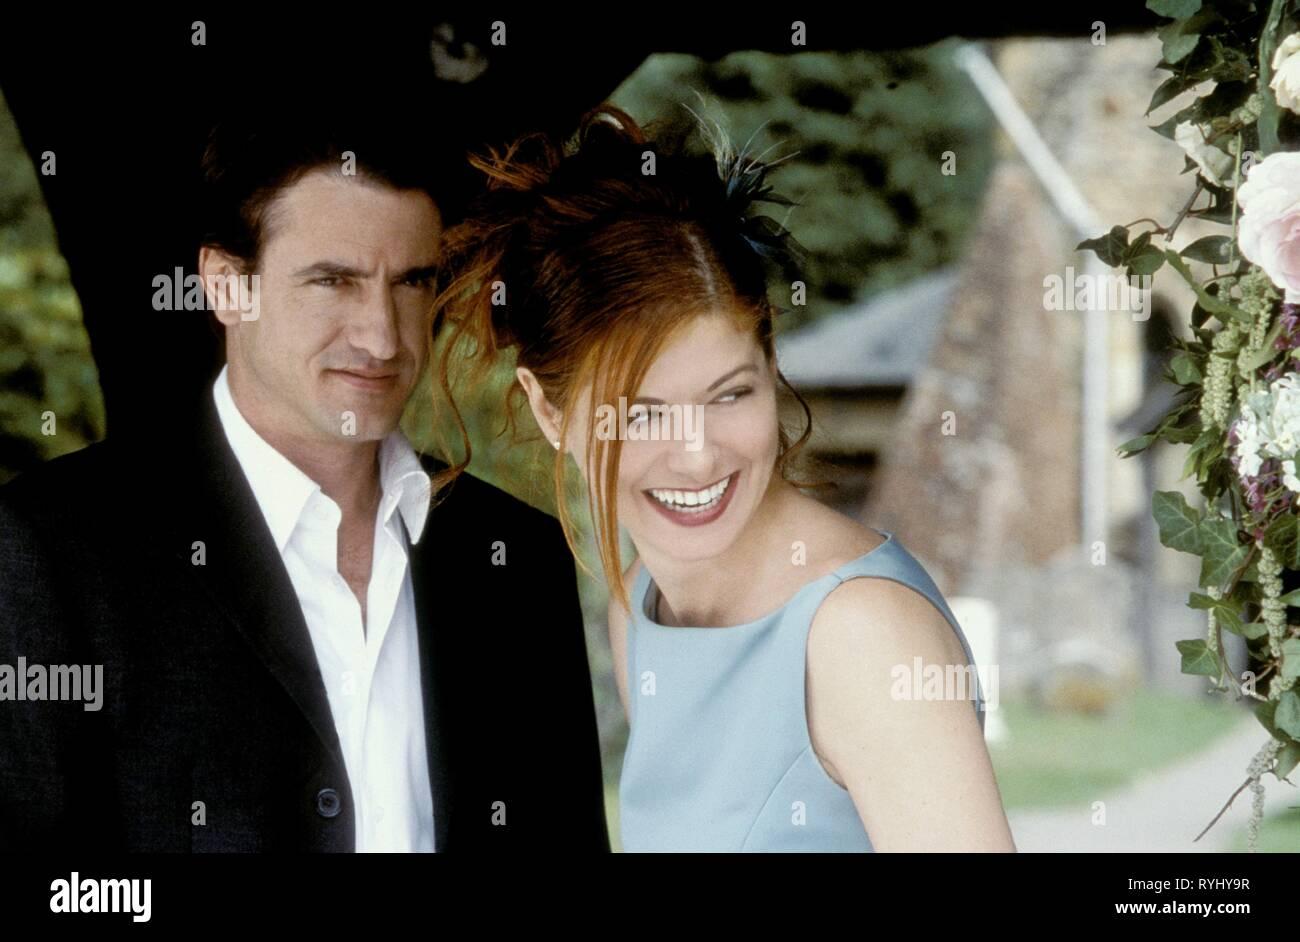 DERMOT MULRONEY, DEBRA MESSING, THE WEDDING DATE, 2005 - Stock Image